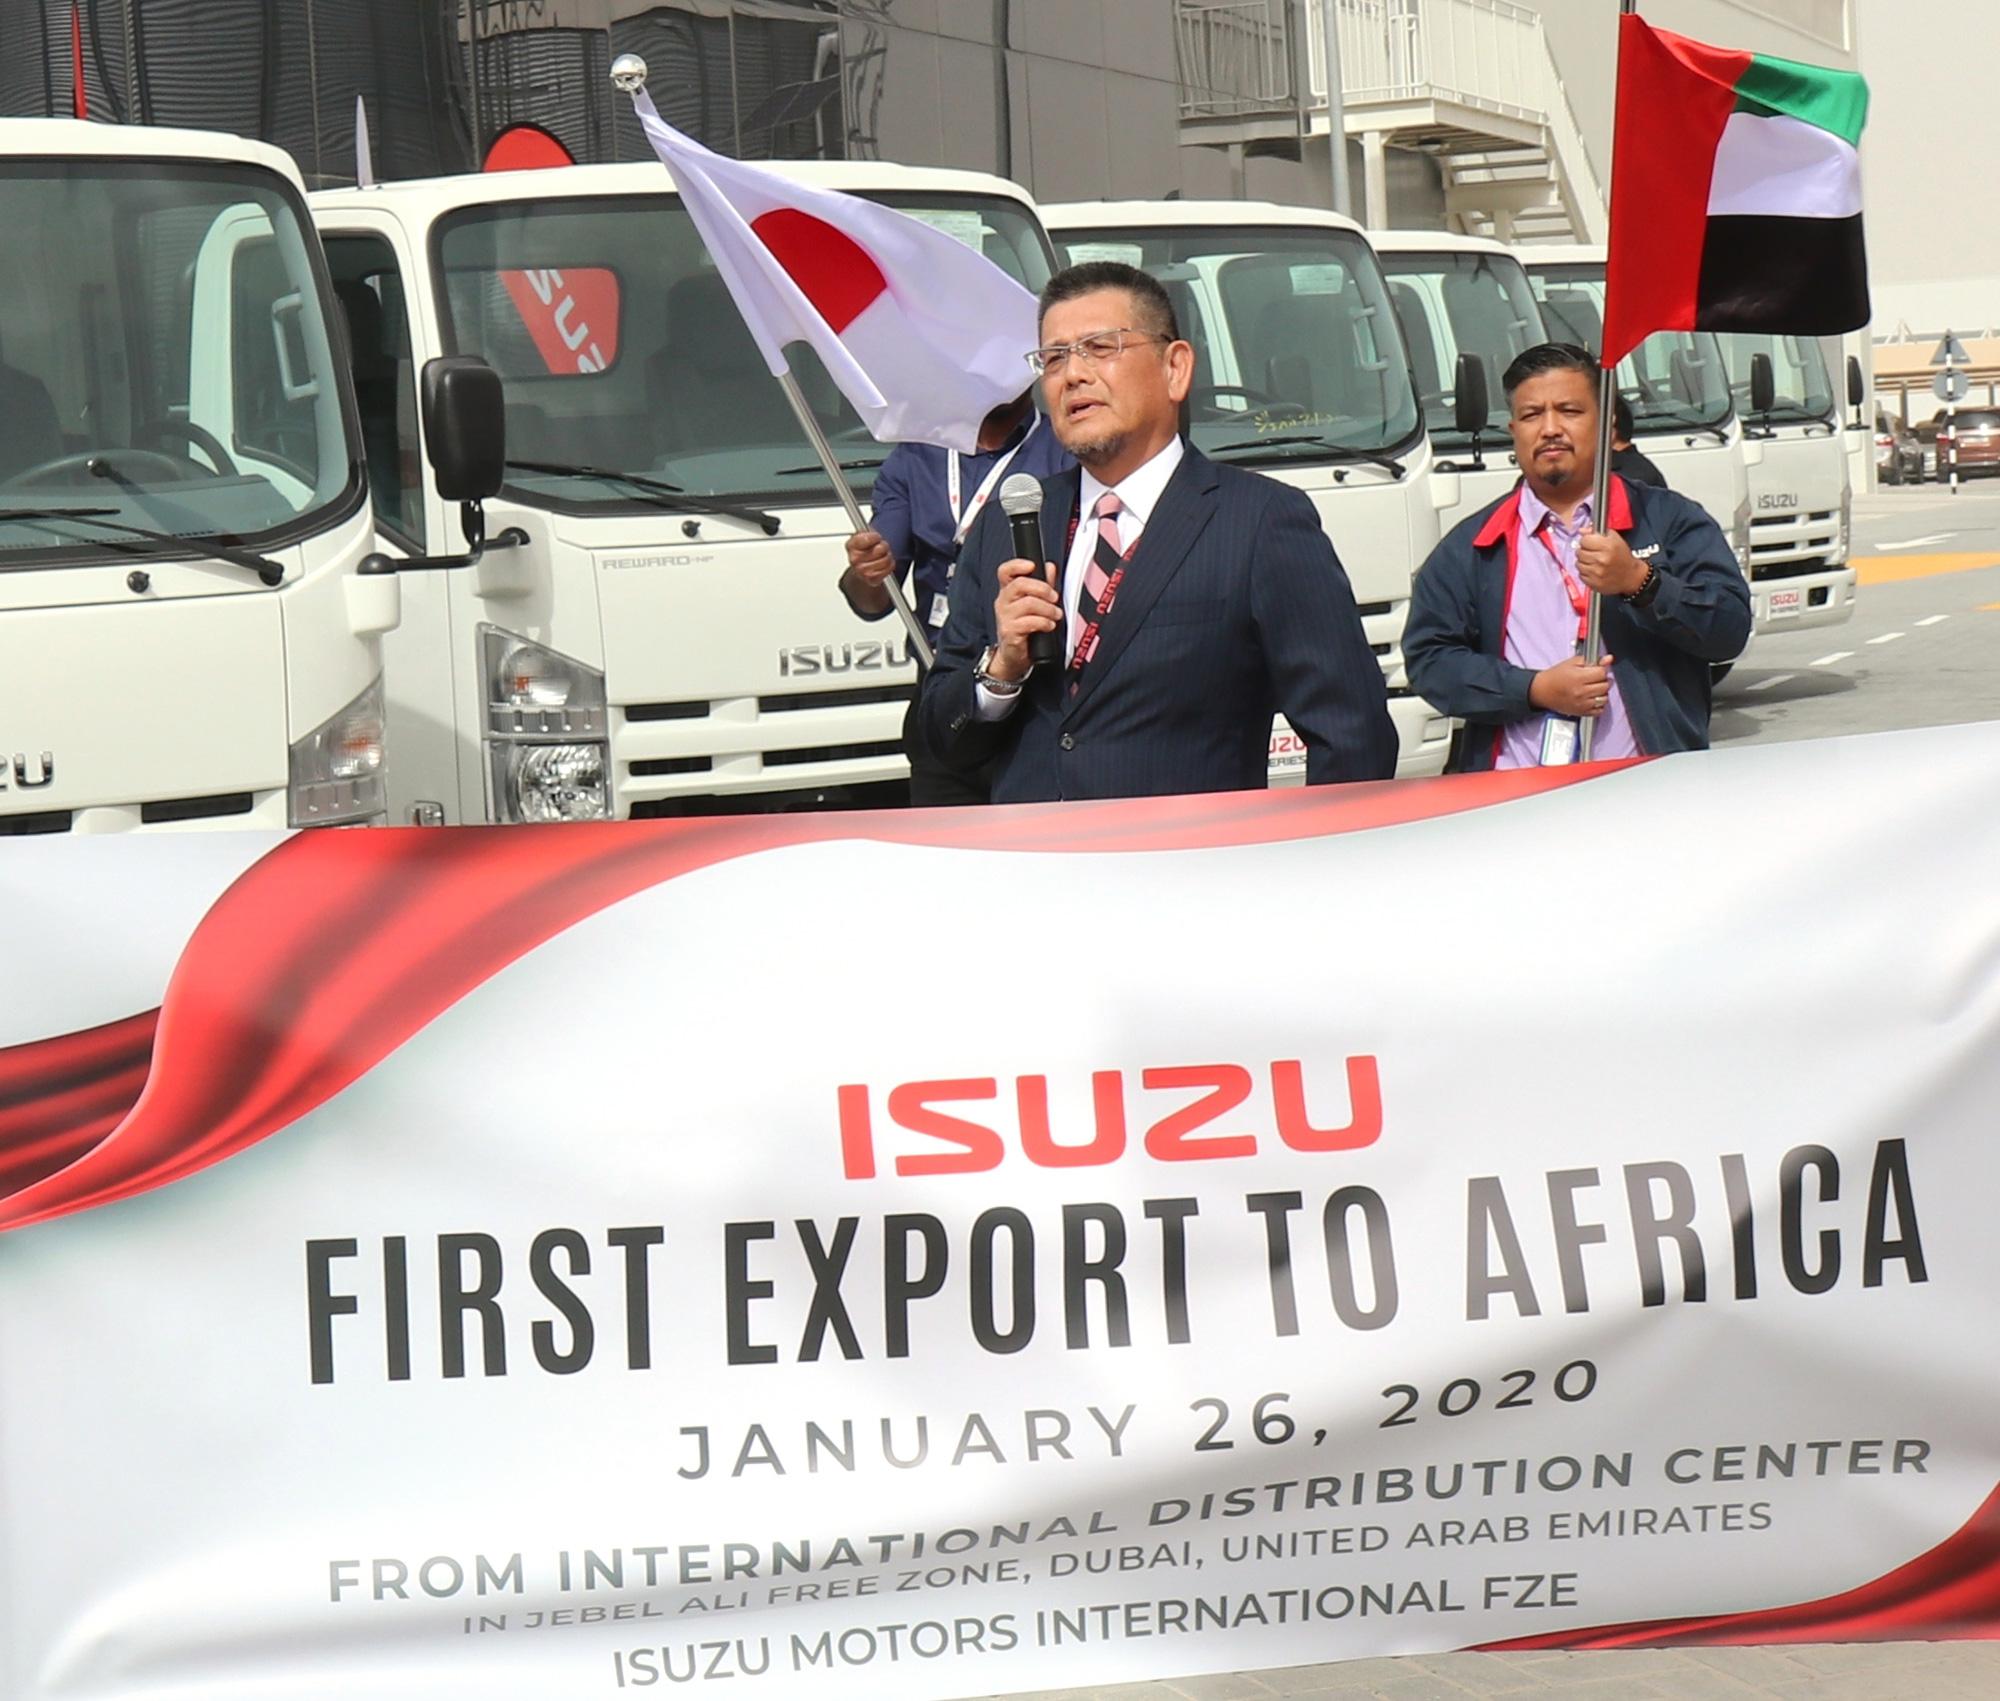 Isuzu First Export to Africa - Opening Ceremony Speech 2